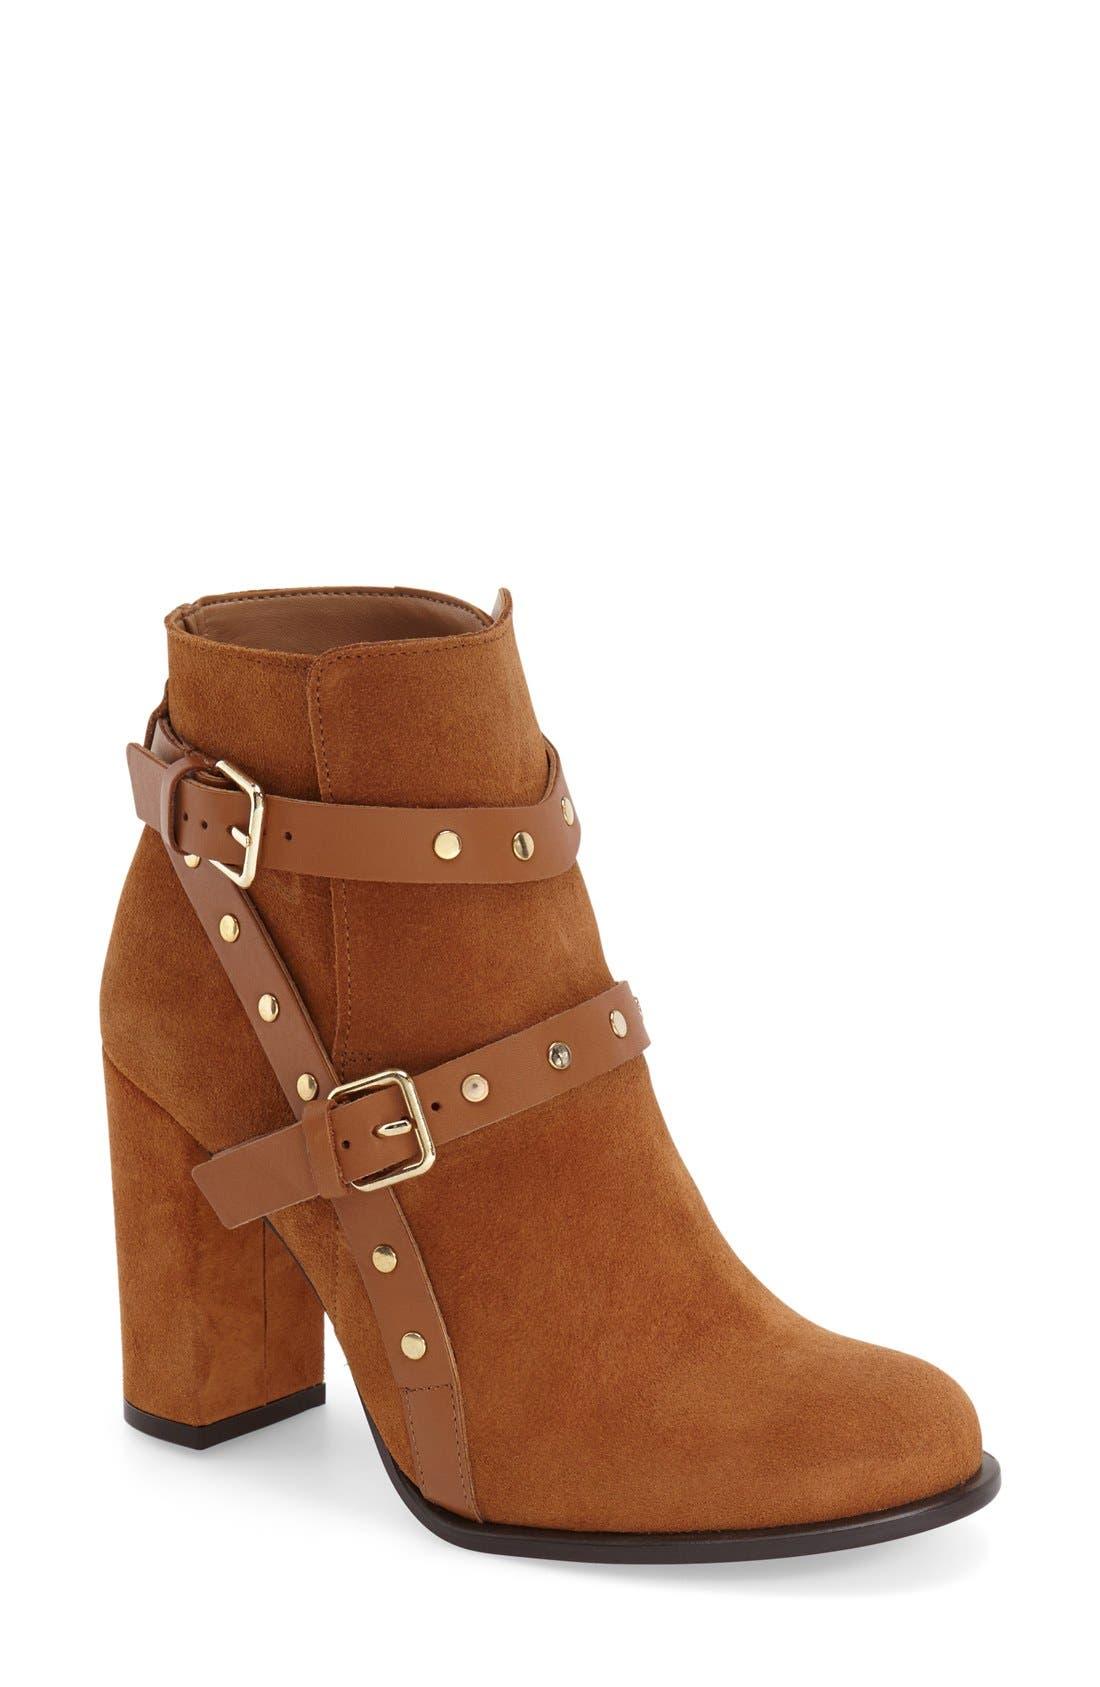 Alternate Image 1 Selected - Topshop 'Harriett' Stud Strap Boot (Women)